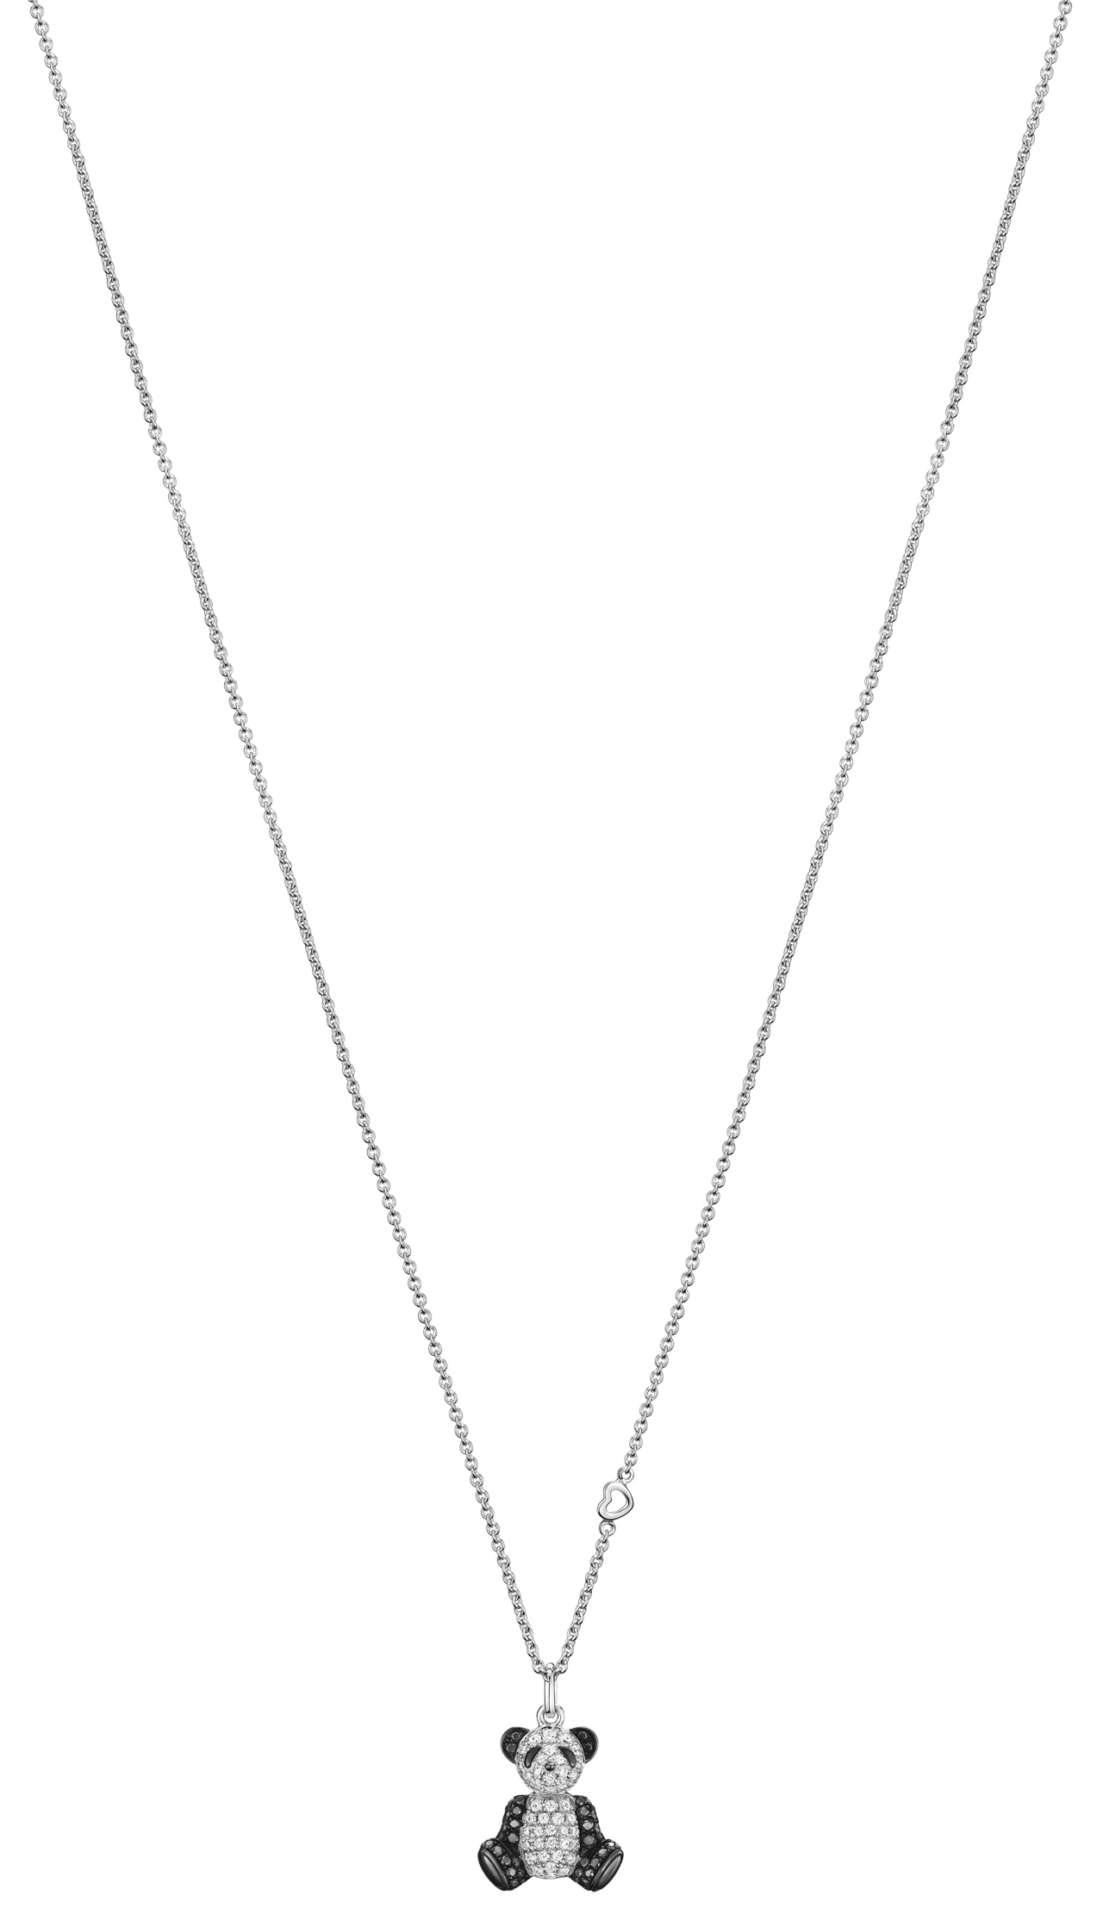 Qeelin新品_Petite Classic Bo Bo 18K 白金鑽石及黑鑽石項鍊 NTD98,800 (BB-040-SNL-WGD)_batch